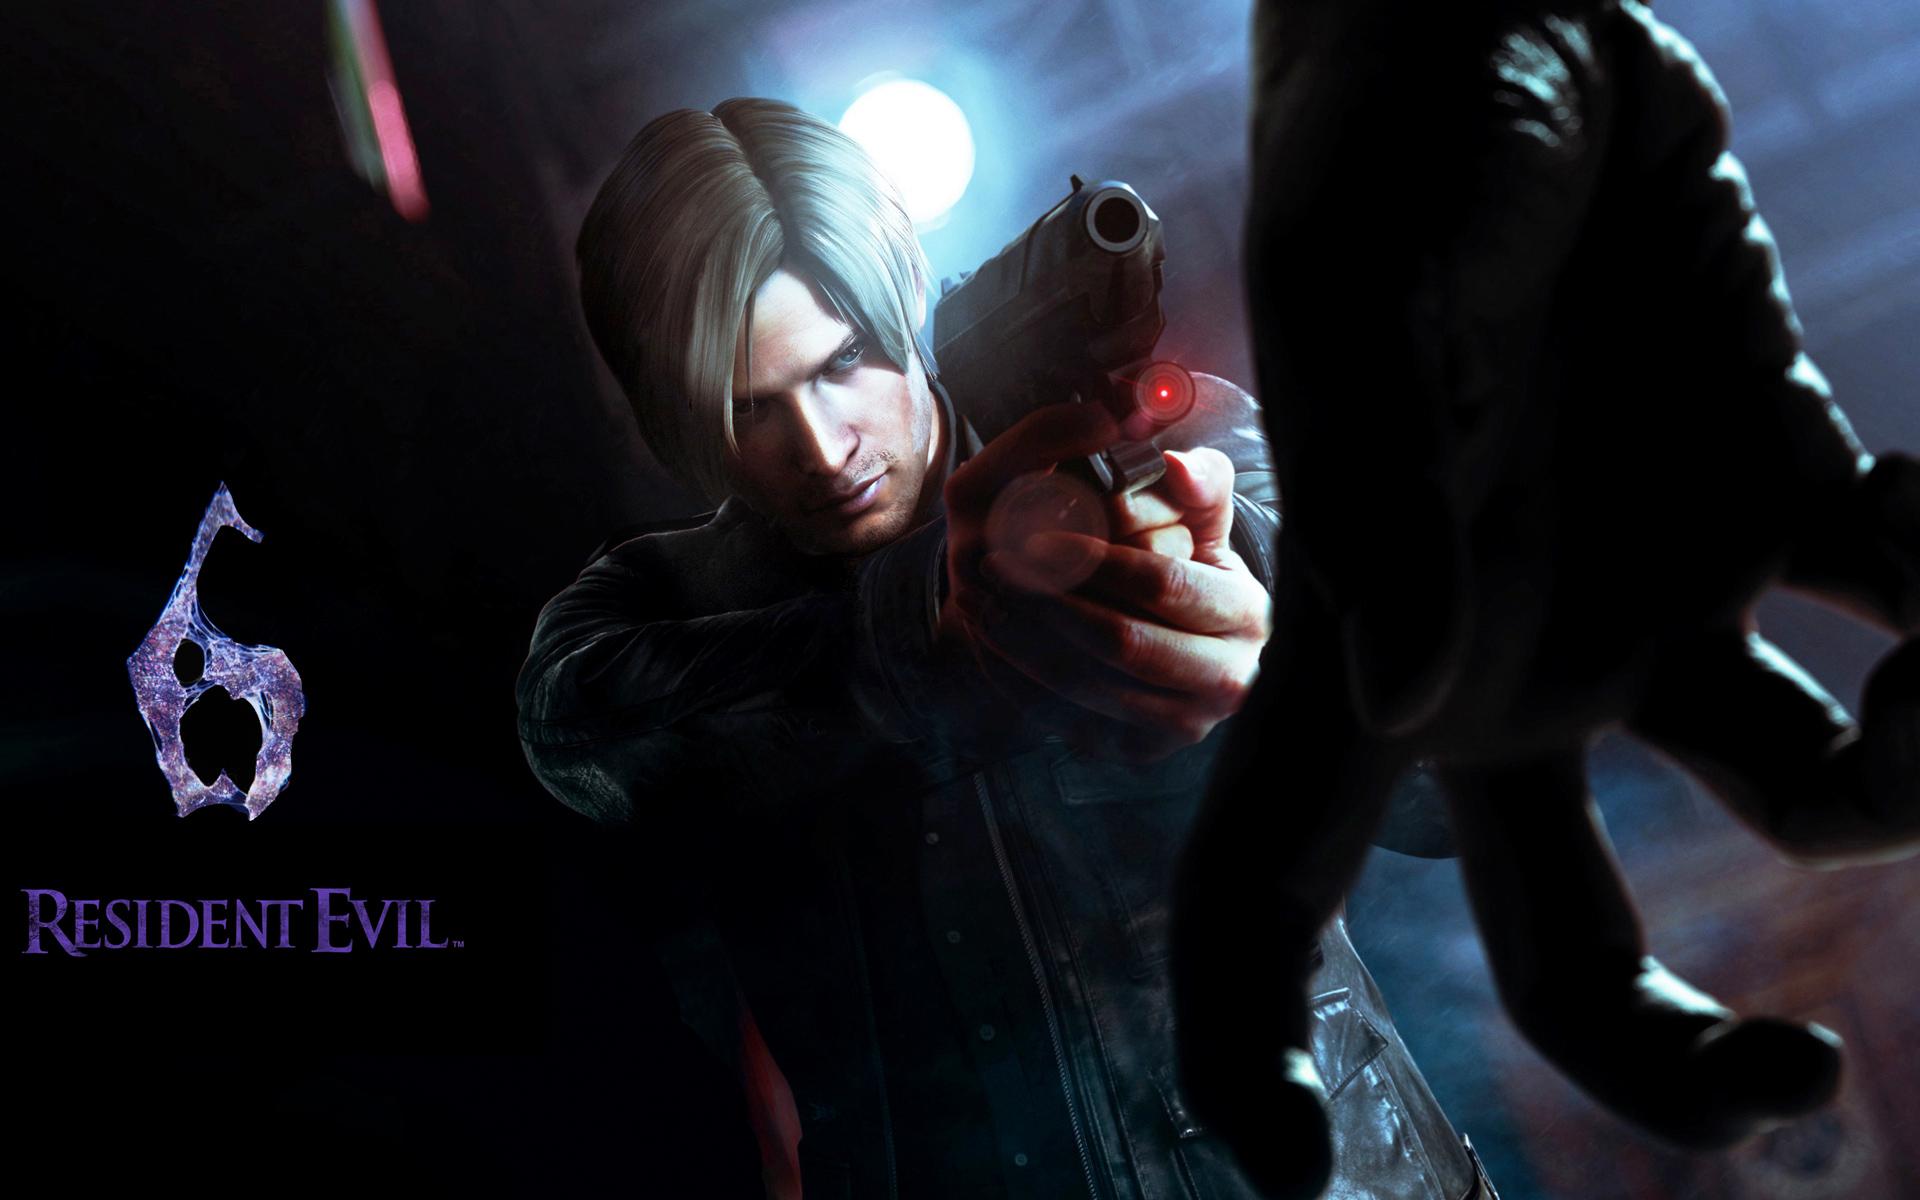 Resident Evil 6 Wallpaper Hd 45903 1920x1200px